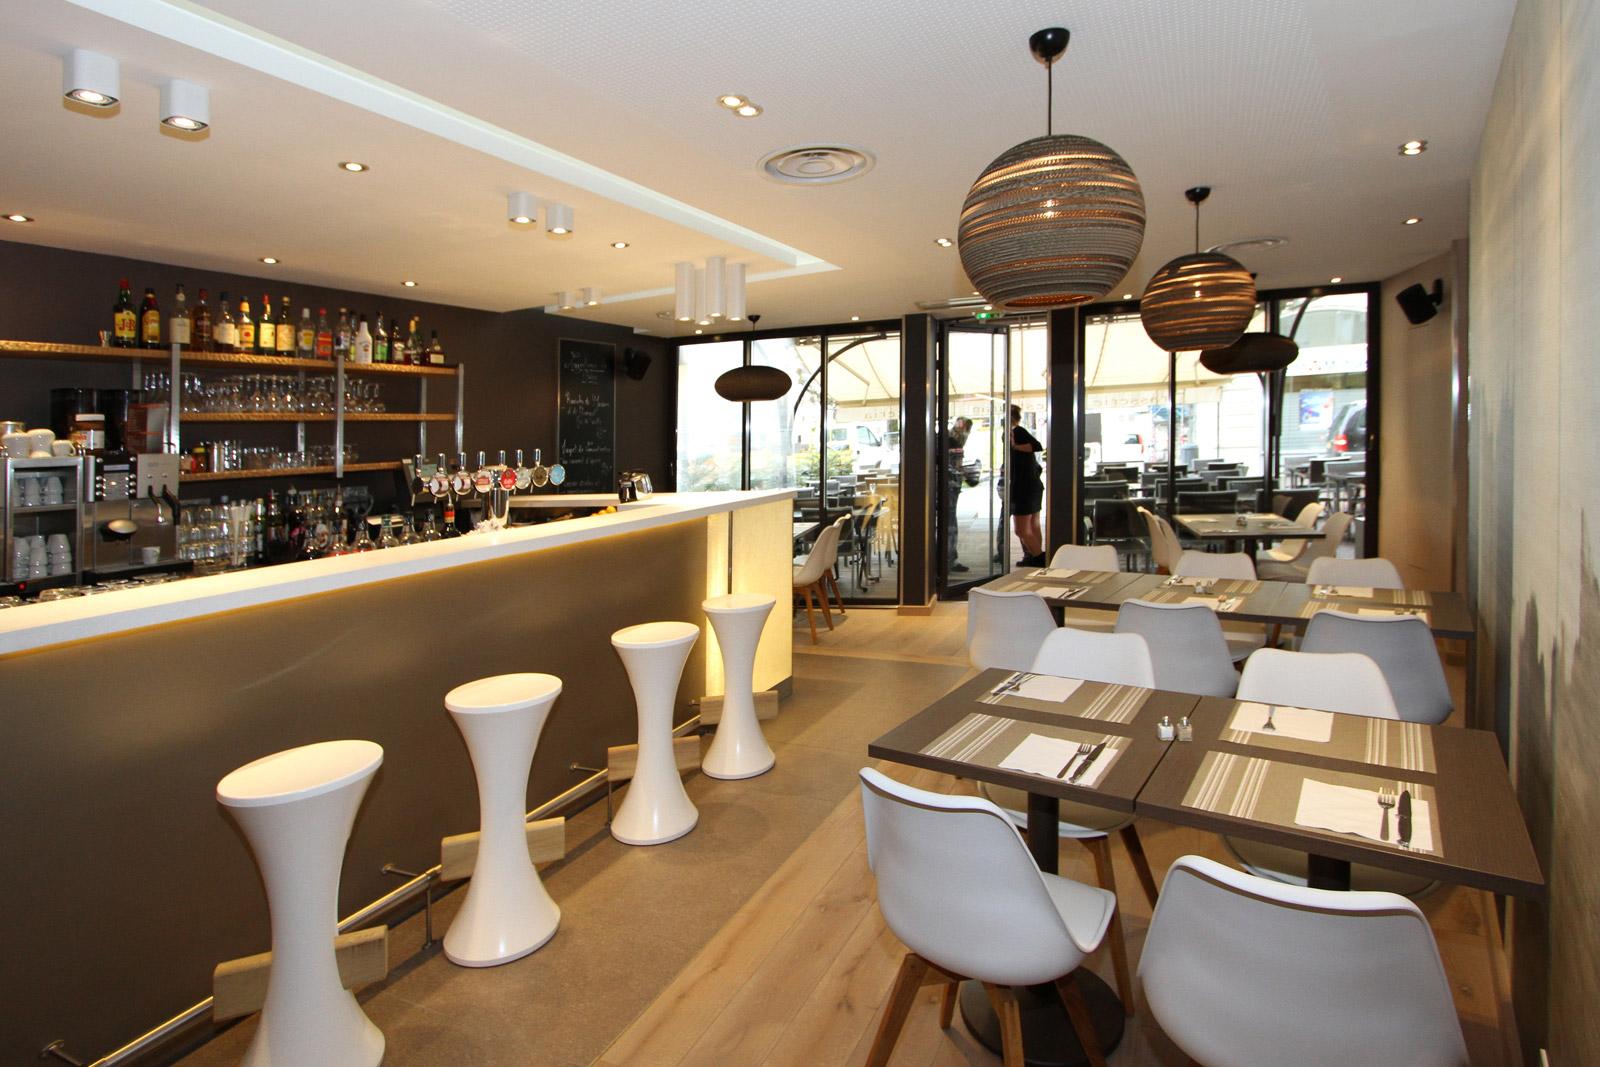 Salle - bar